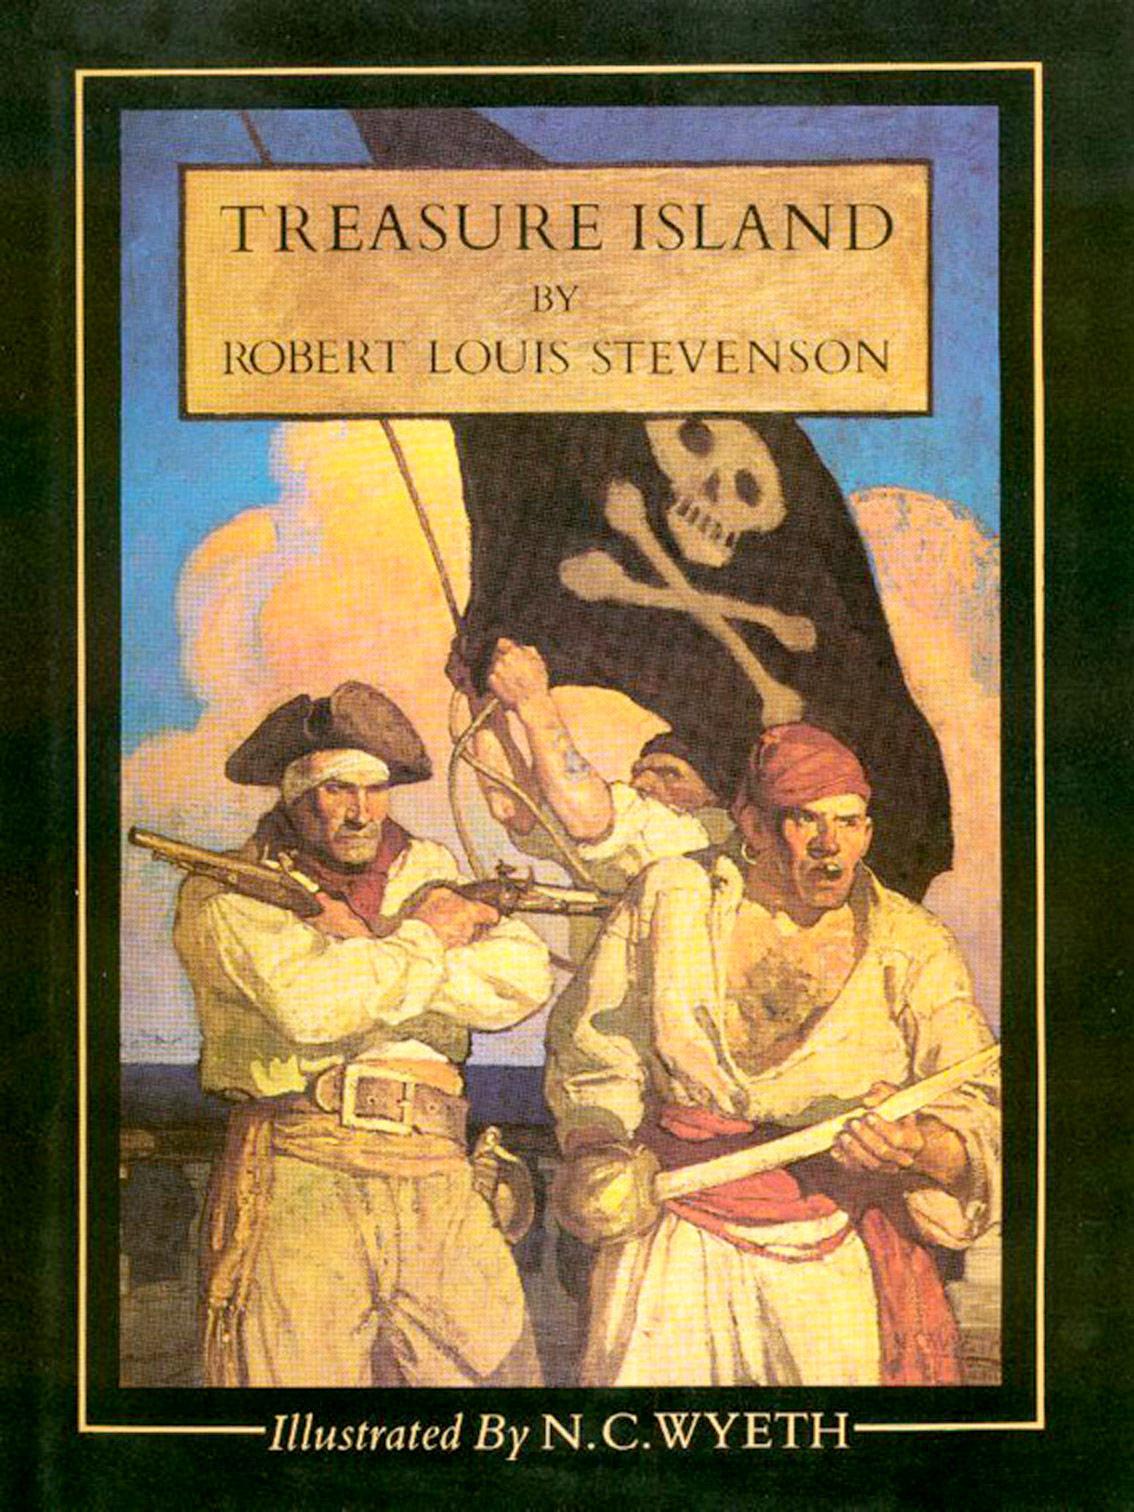 Treasure Island Backgrounds on Wallpapers Vista